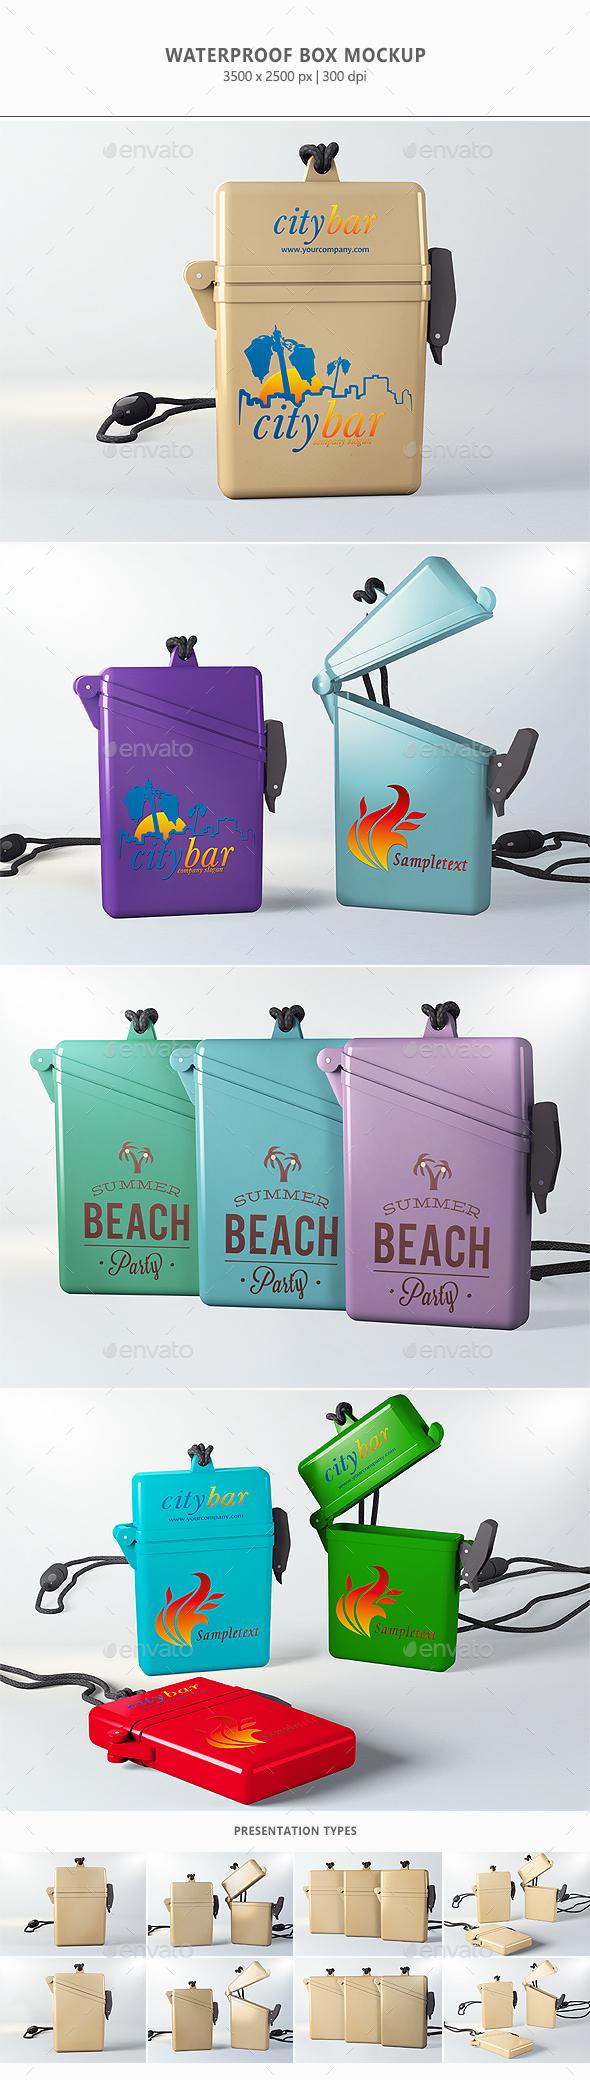 Waterproof Box Mock-up - Packaging Product Mock-Ups